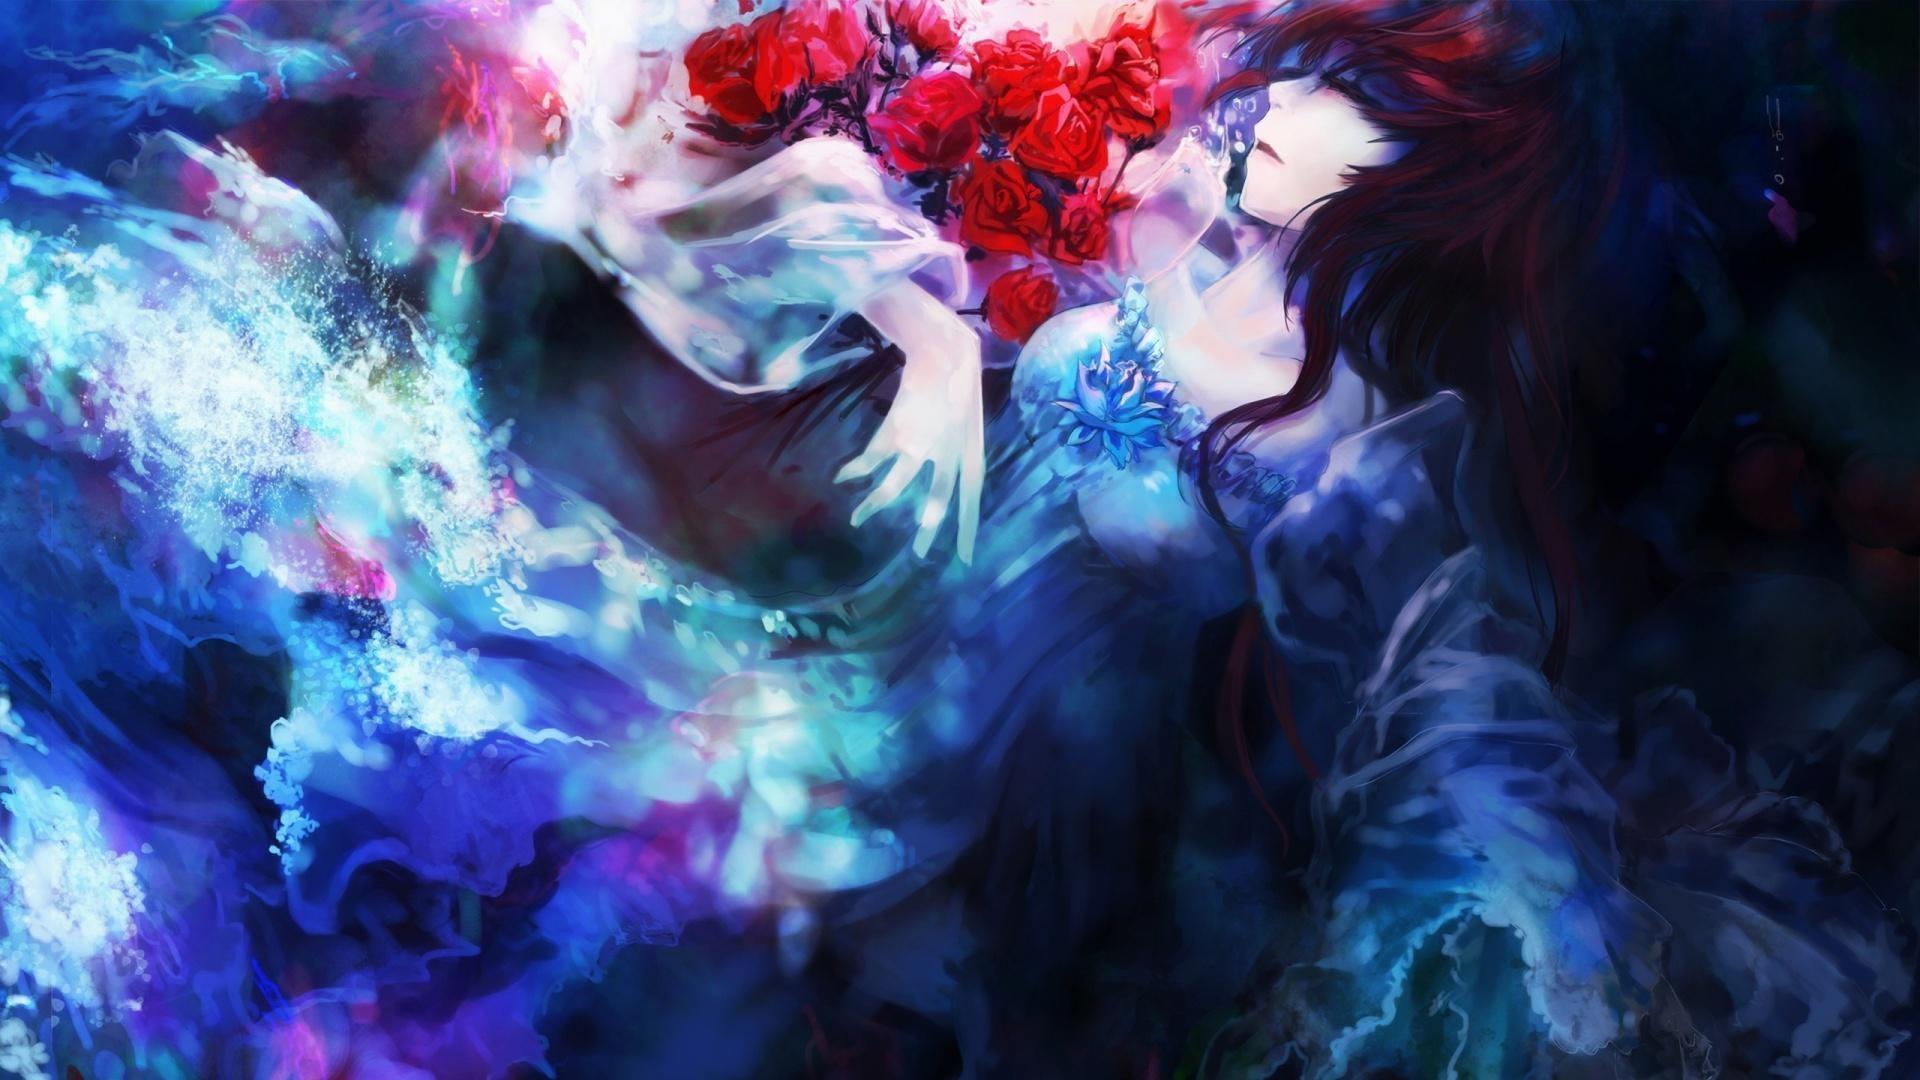 wallpaper.wiki-Dream-1920×1080-Anime-Wallpaper-PIC-WPD0014704